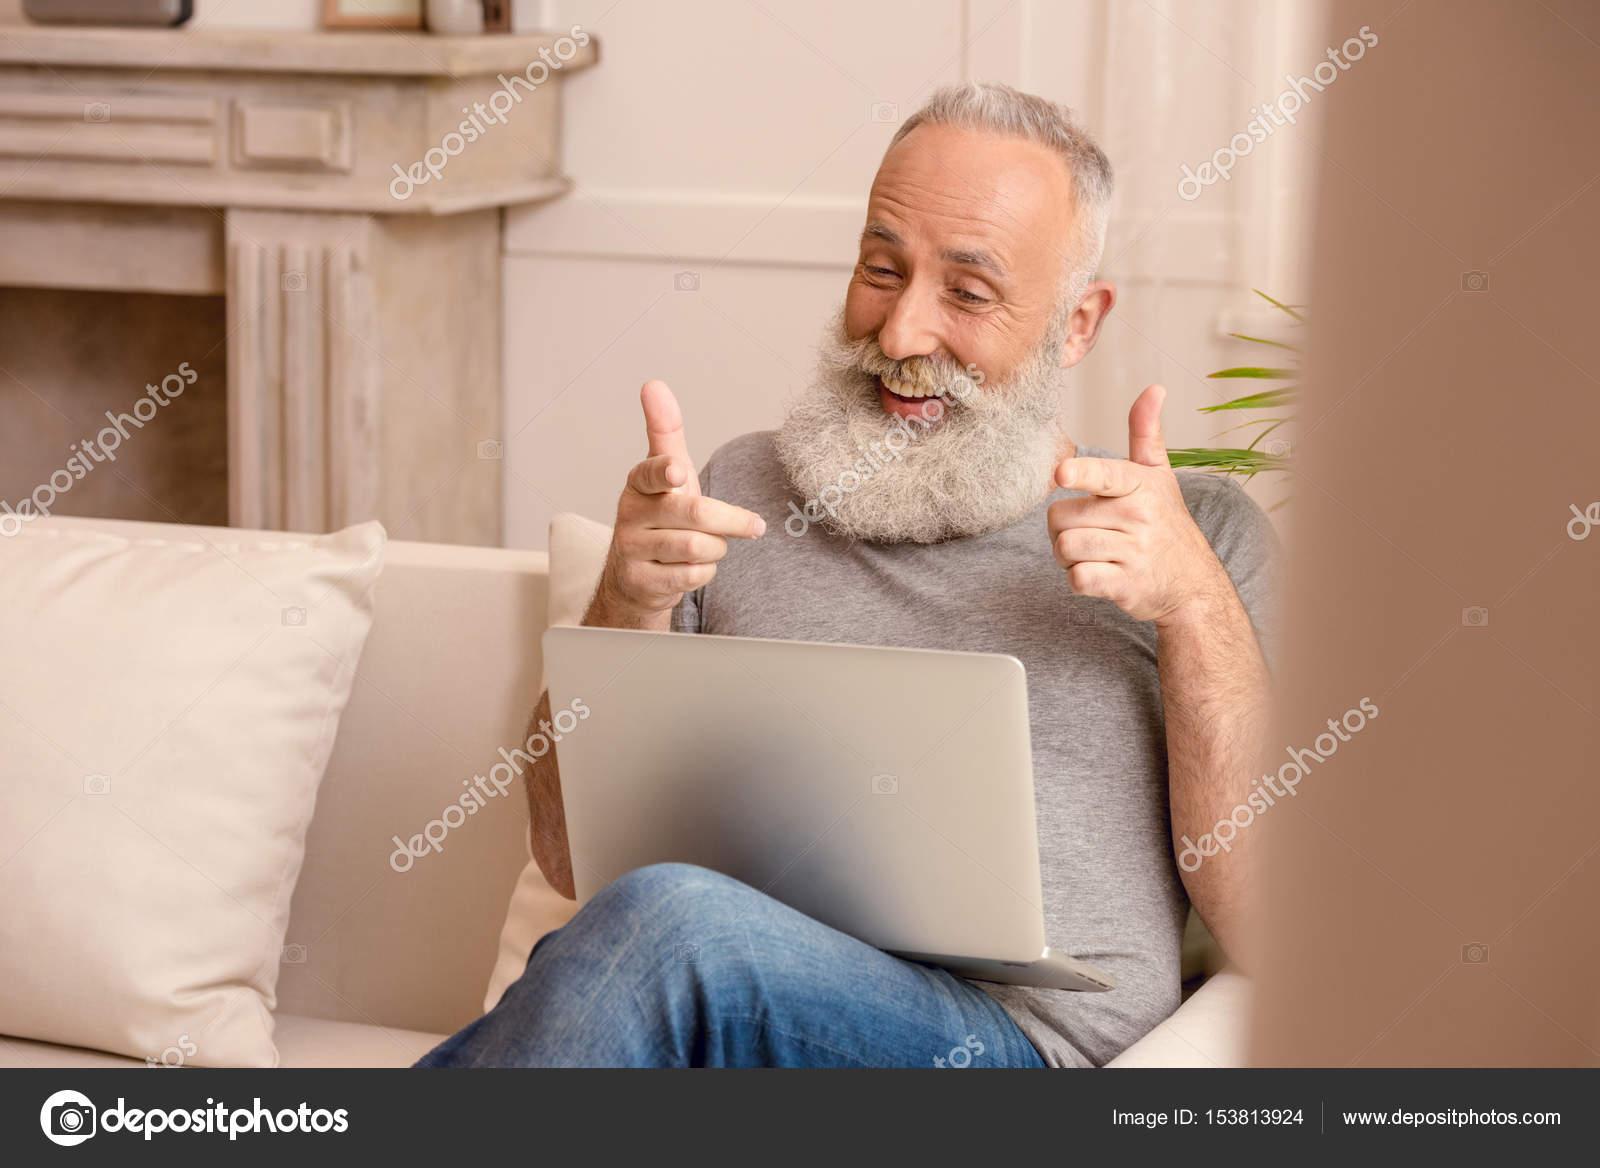 homme senior l 39 aide d 39 ordinateur portable photographie dimabaranow 153813924. Black Bedroom Furniture Sets. Home Design Ideas